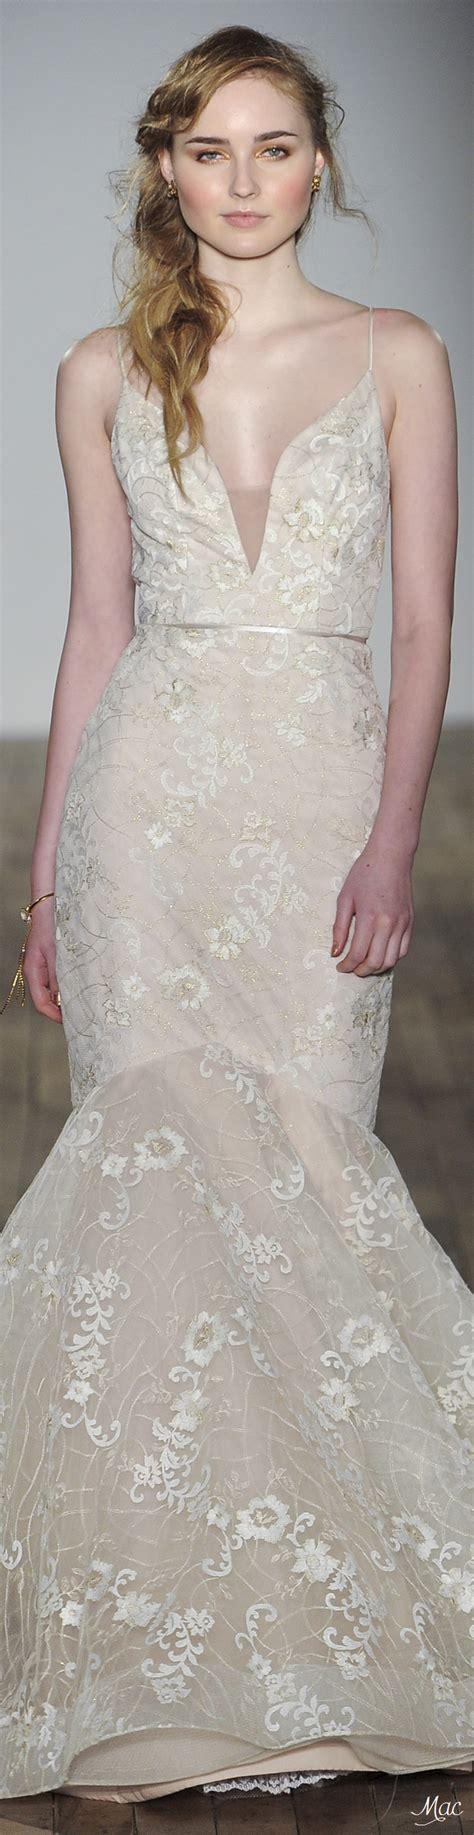 Spring 2018 Bridal JLM Couture | Bridal couture, Dresses ...